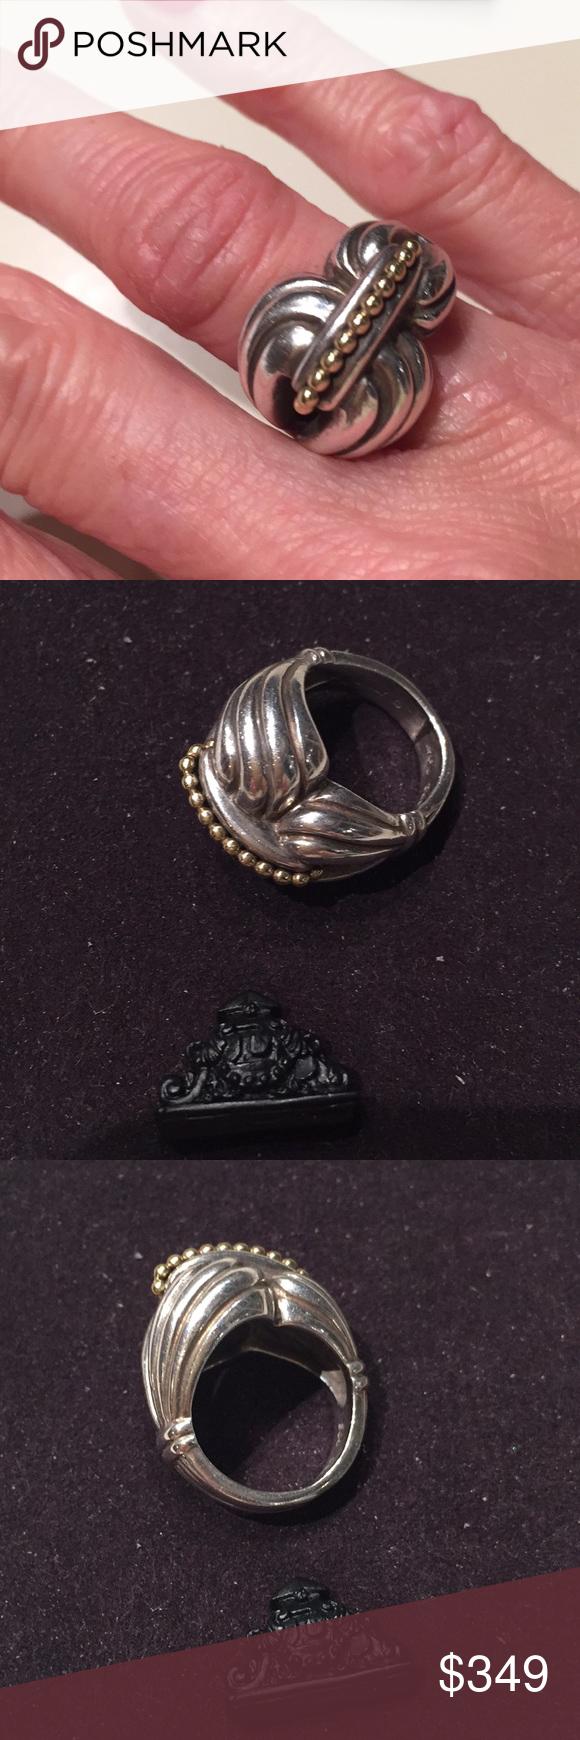 Lagos Ring Womens jewelry rings, Lagos ring, Lagos